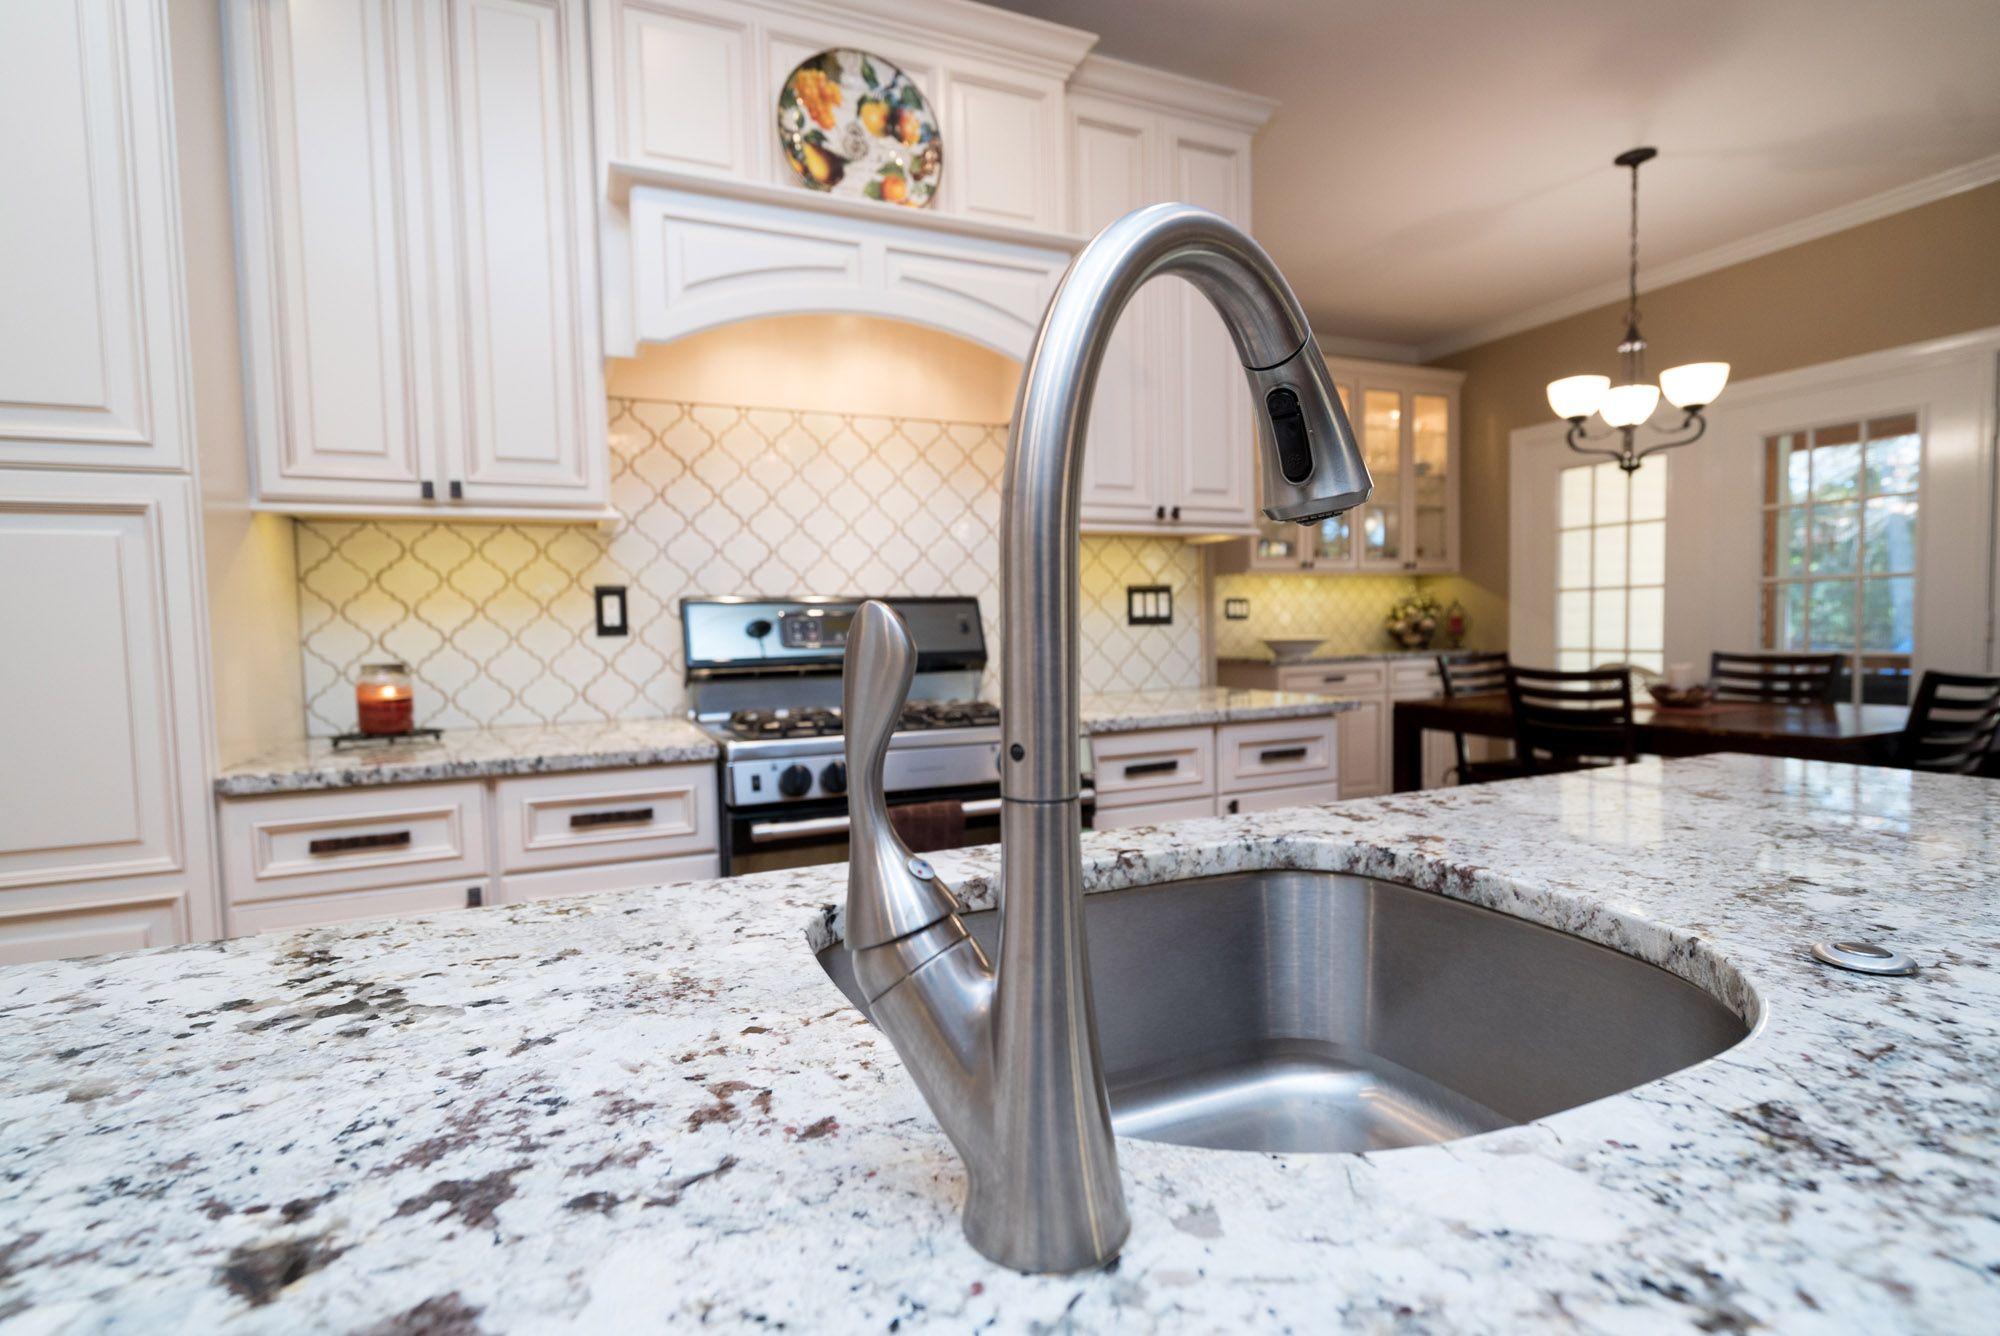 Kitchen Remodeling In Leesburg VA Charlene Kitchen Cabinets In - Bathroom remodeling leesburg va